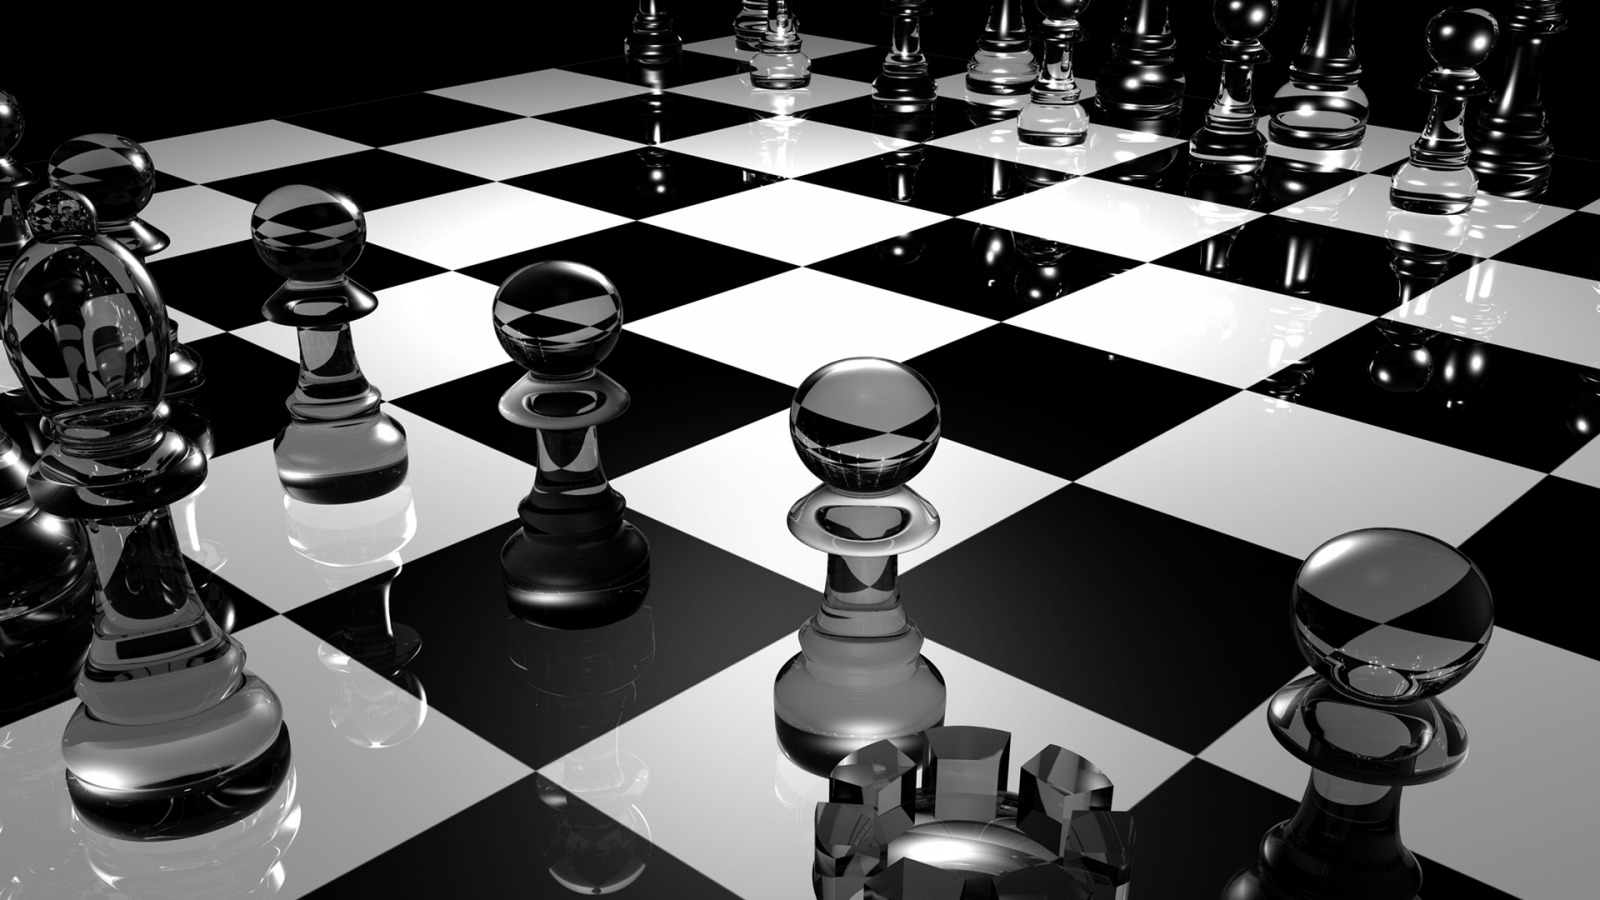 3D Chess Board Wallpaper Models Wallpapers